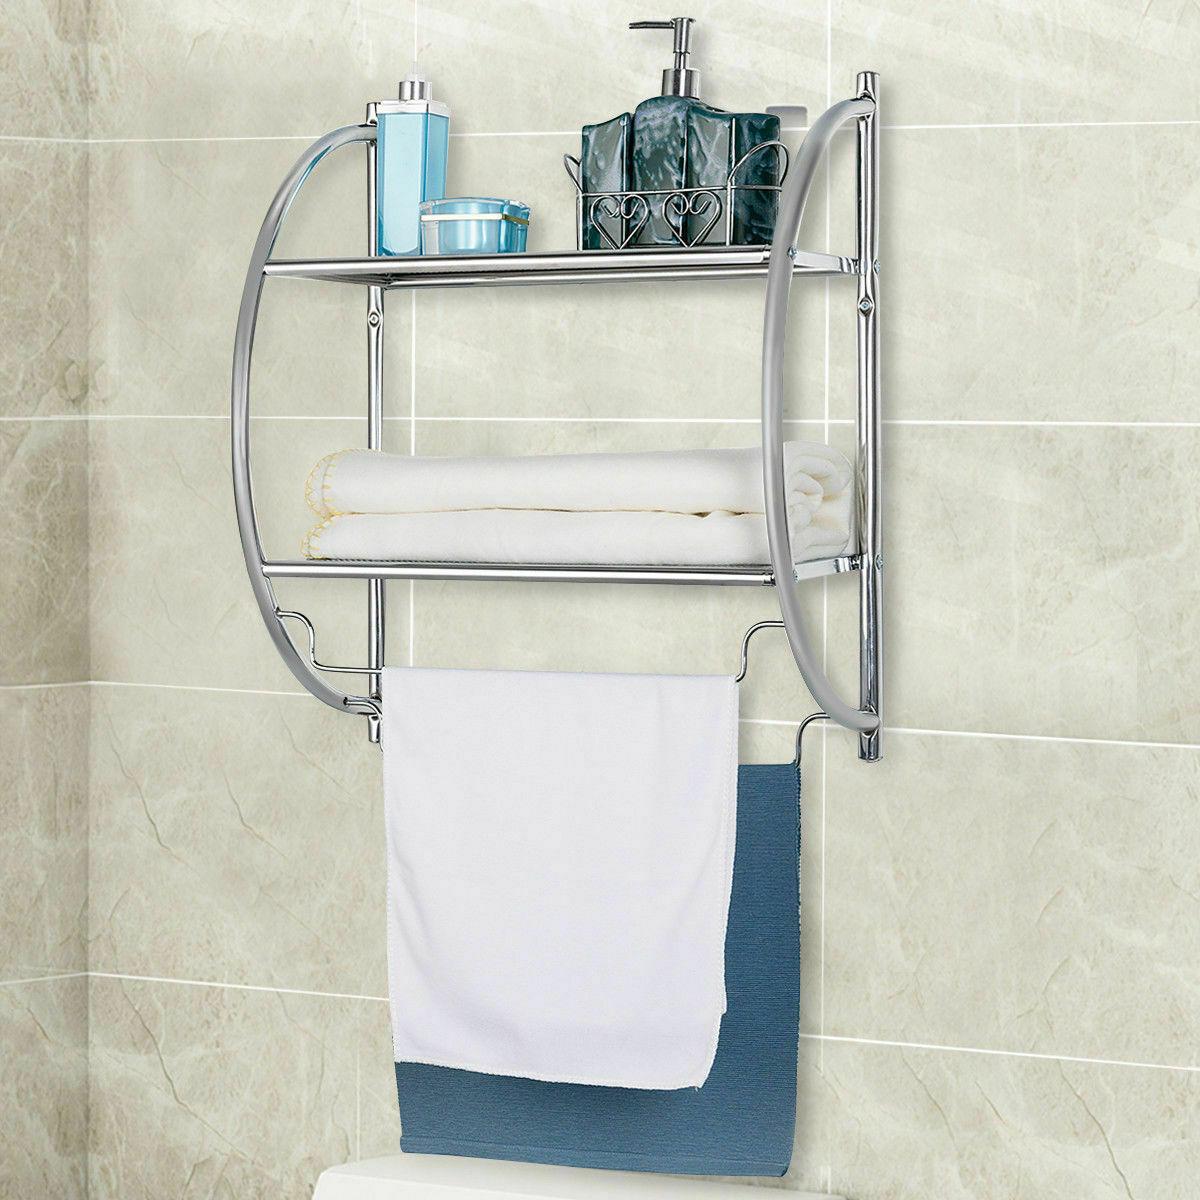 2 Tier Wall Mount Shower Organizer Holder Storage Rack Towel Bar Toilet Bathroom For Sale Online